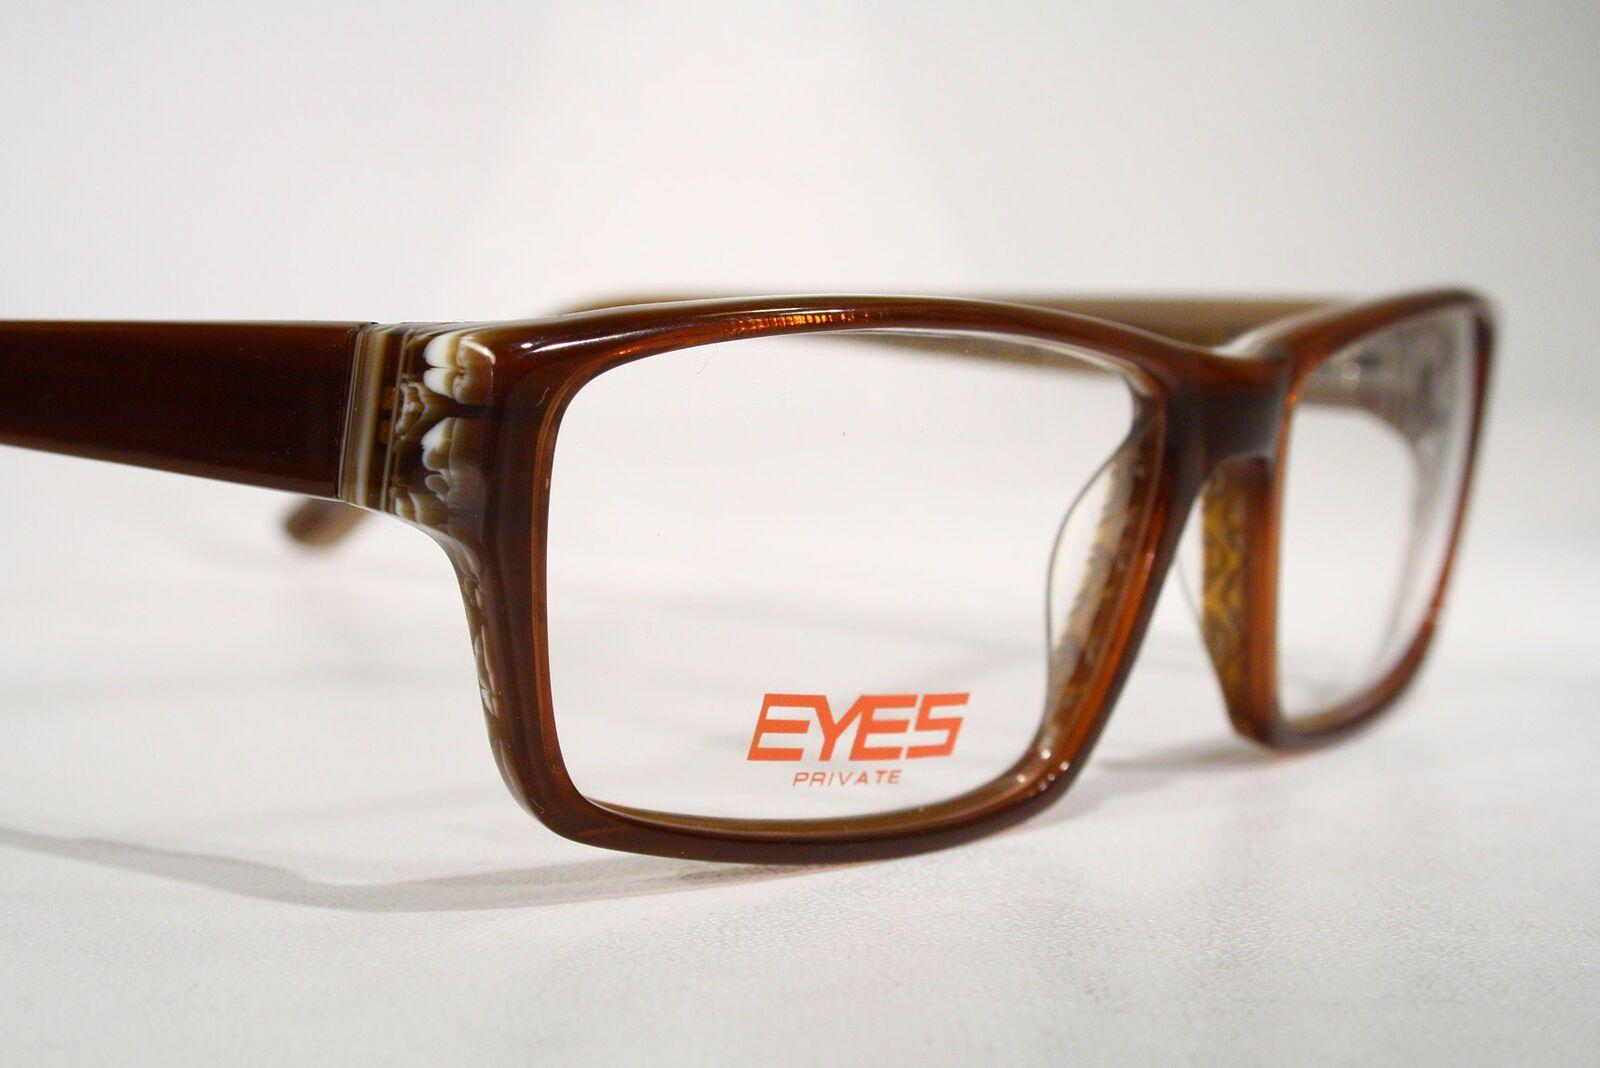 3538868a6f3 Unisex New PRIVATE EYES Brown Plastic Eyeglasses Optical Frames Glasses    eBay (RipVanW)